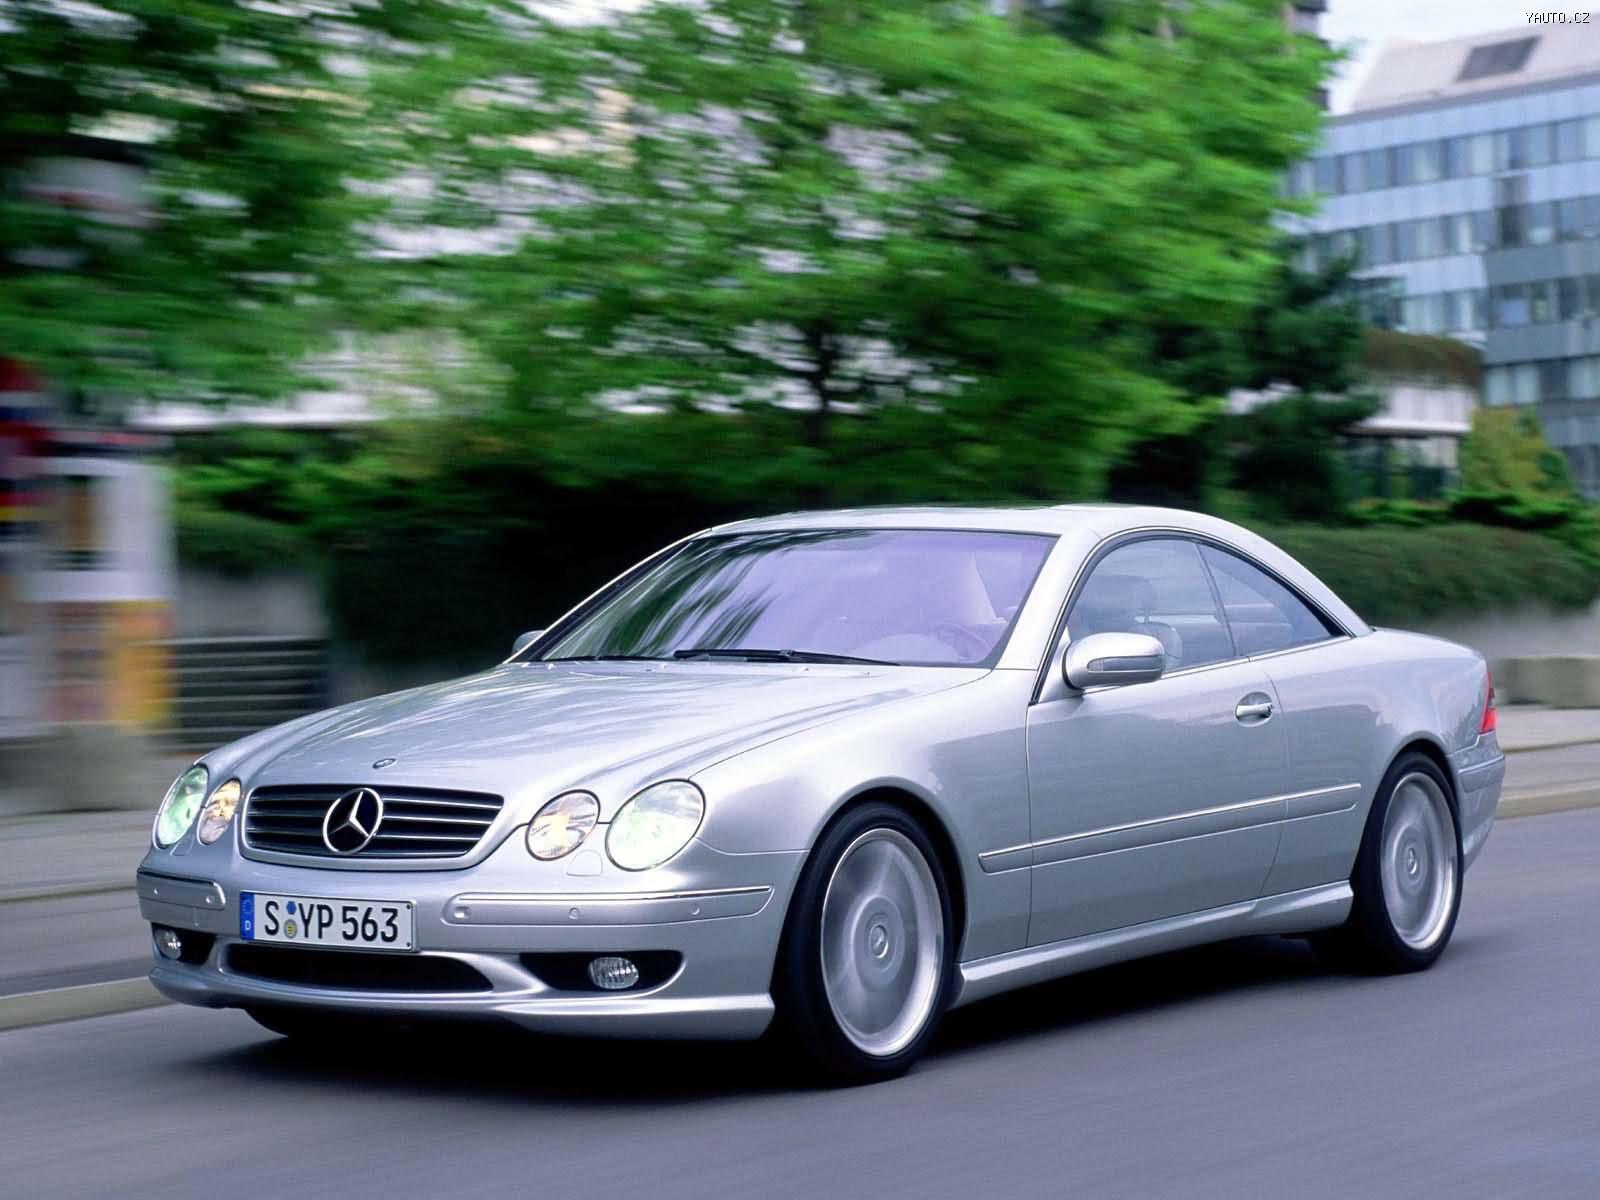 Mercedes benz cl55 amg 2000 auta na plochu tapety na for Mercedes benz cl amg